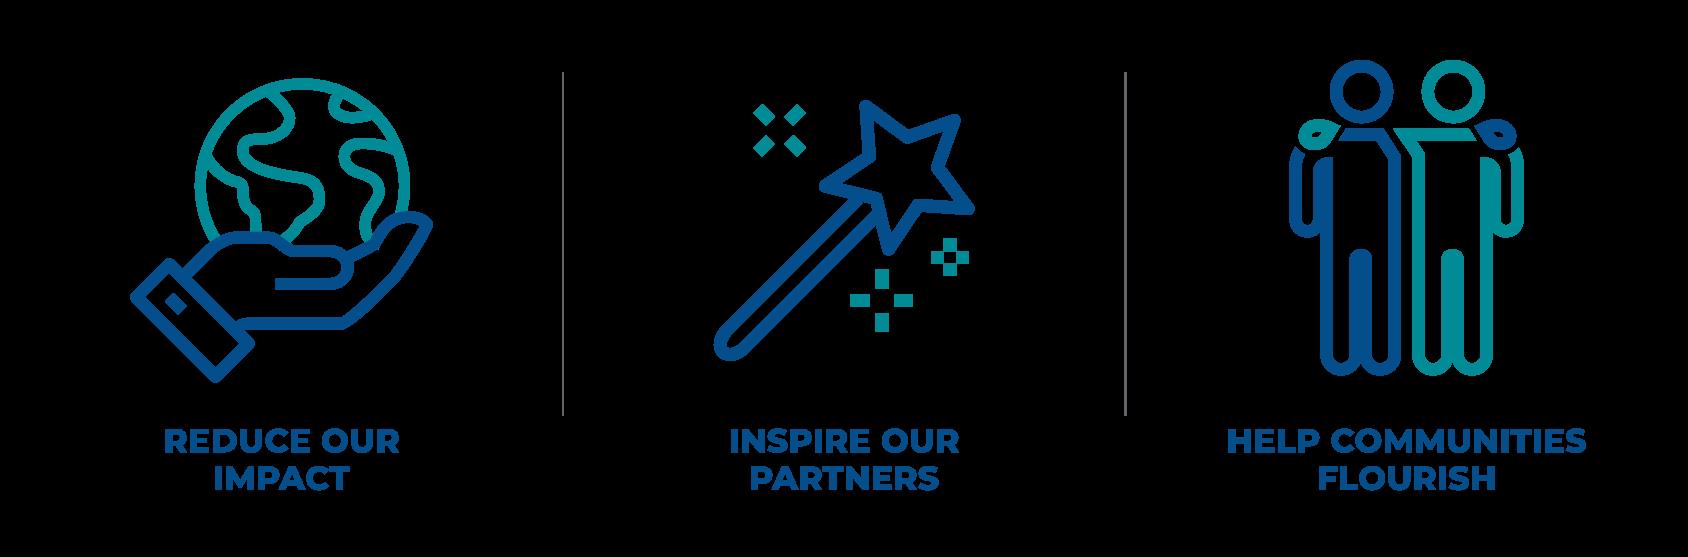 reduce impact inspire help